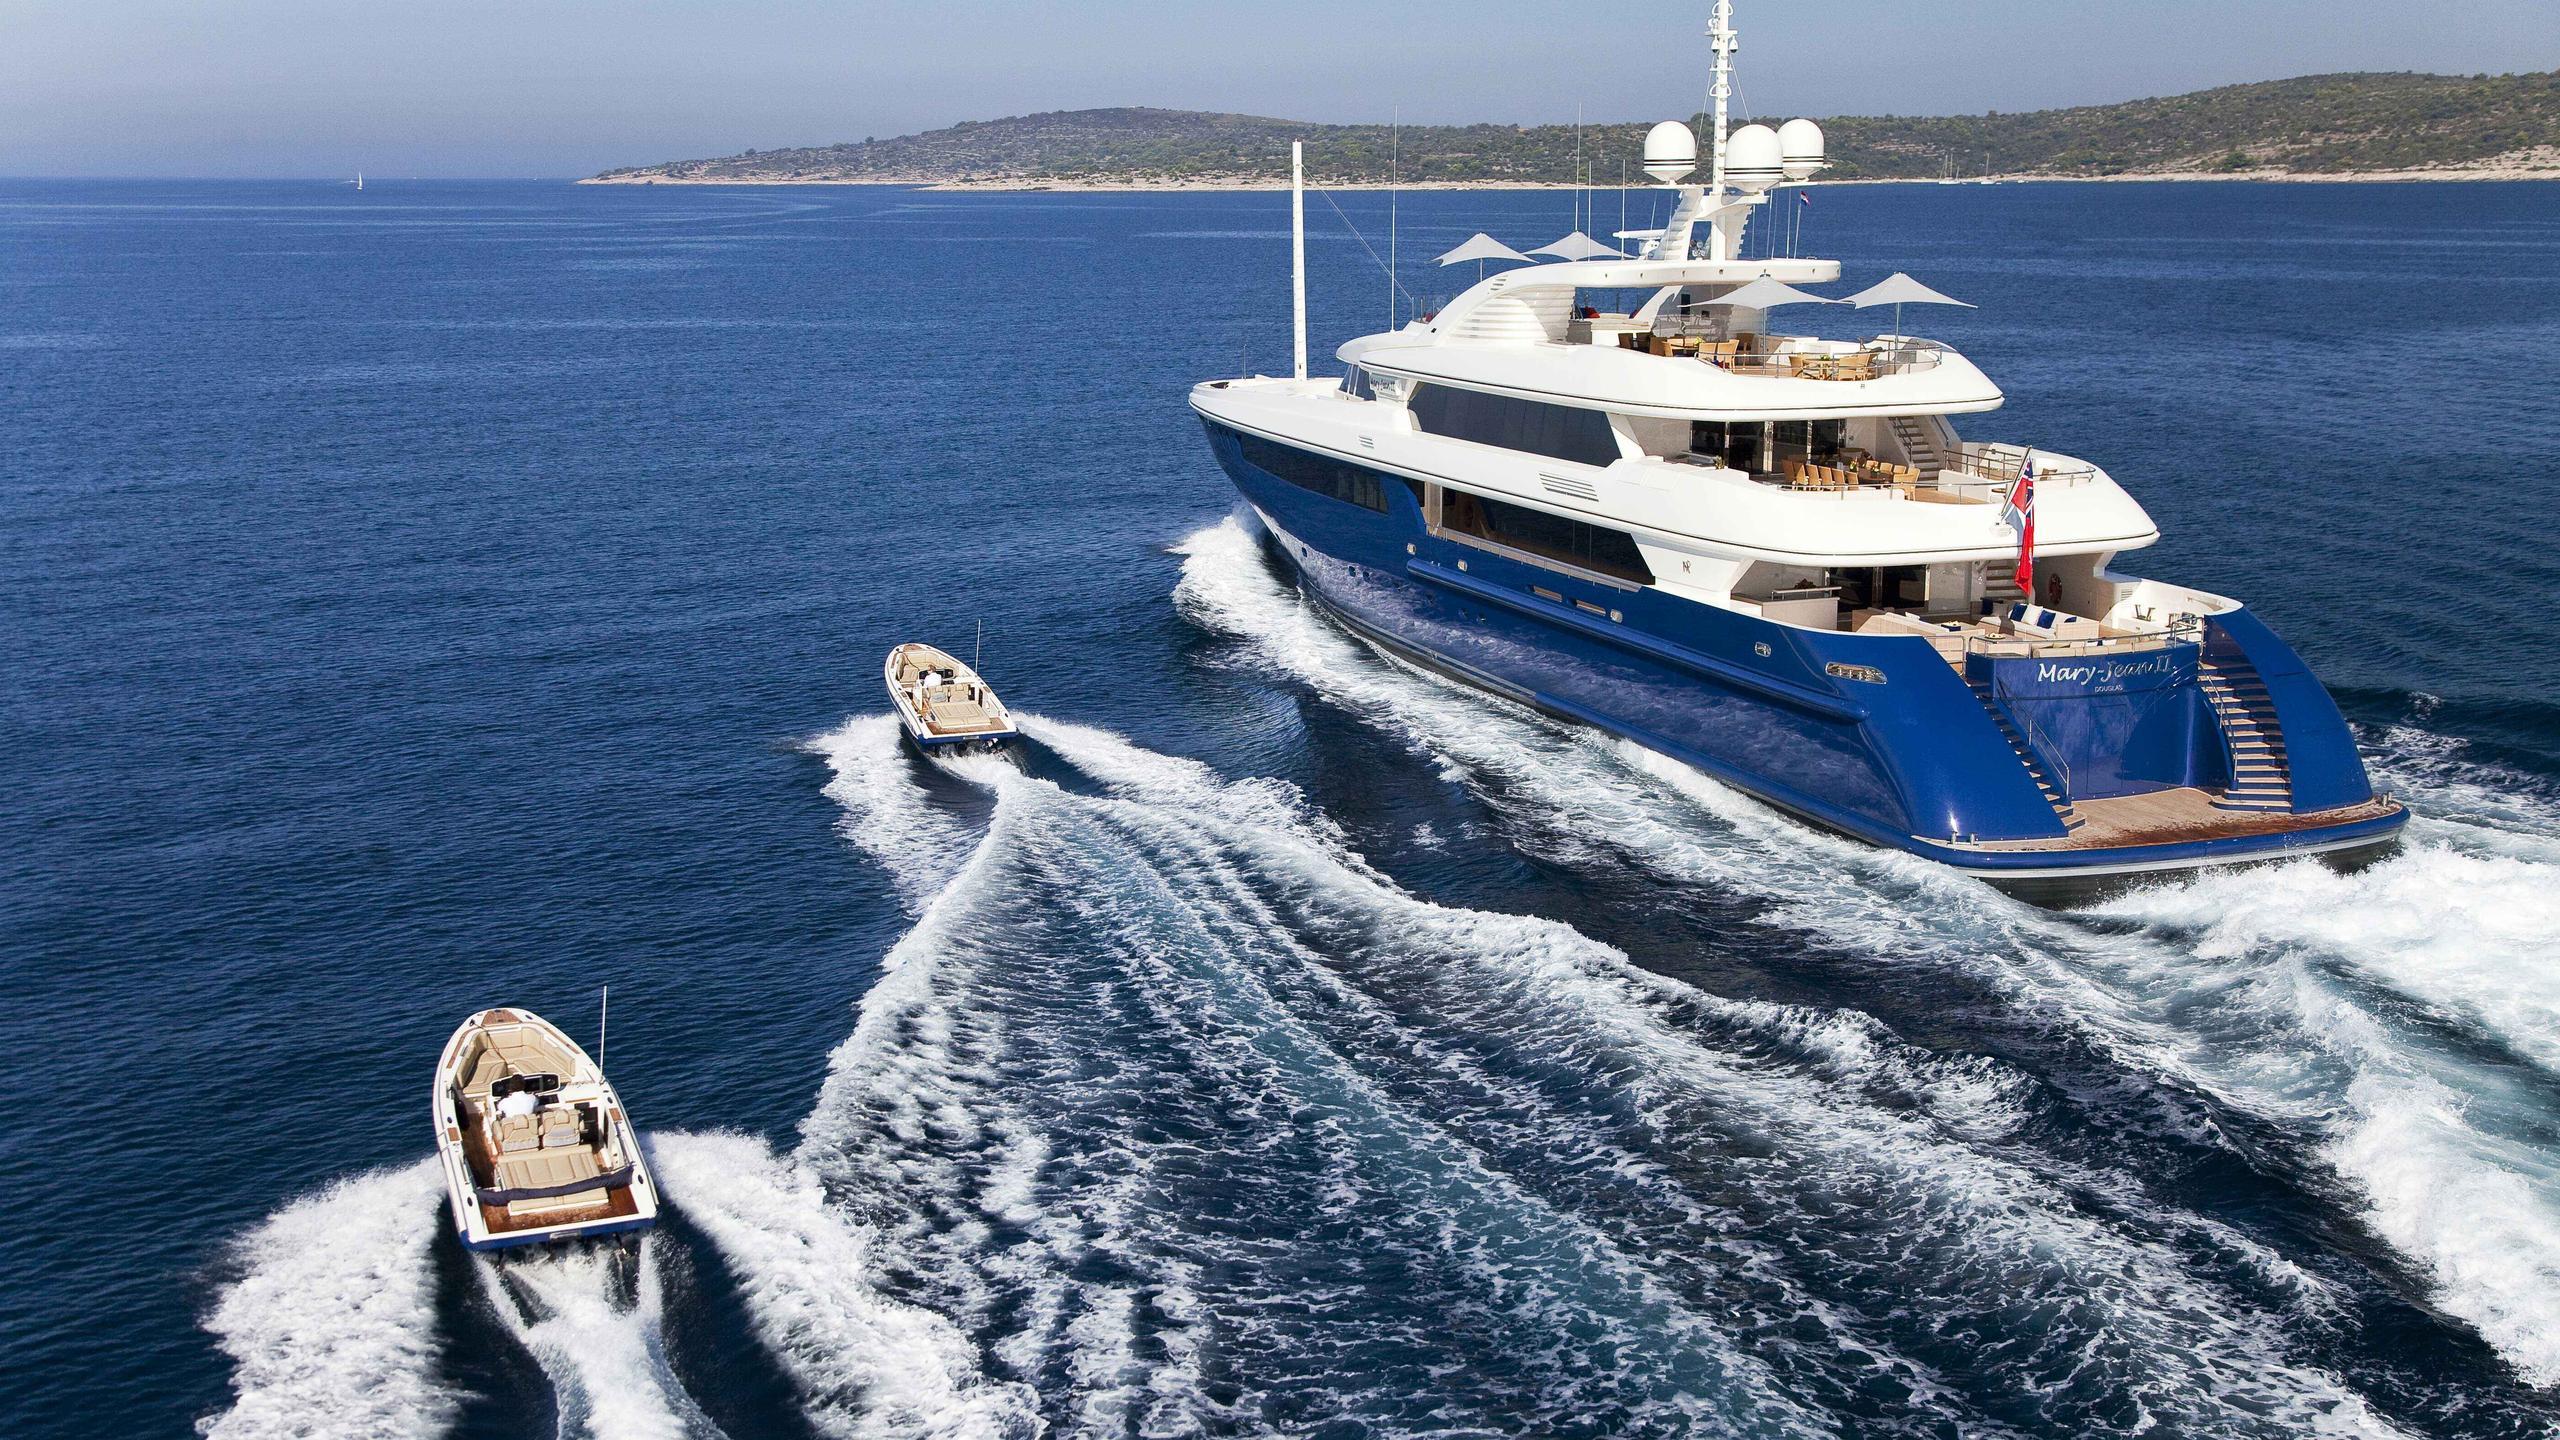 Mary Jean II yacht running stern